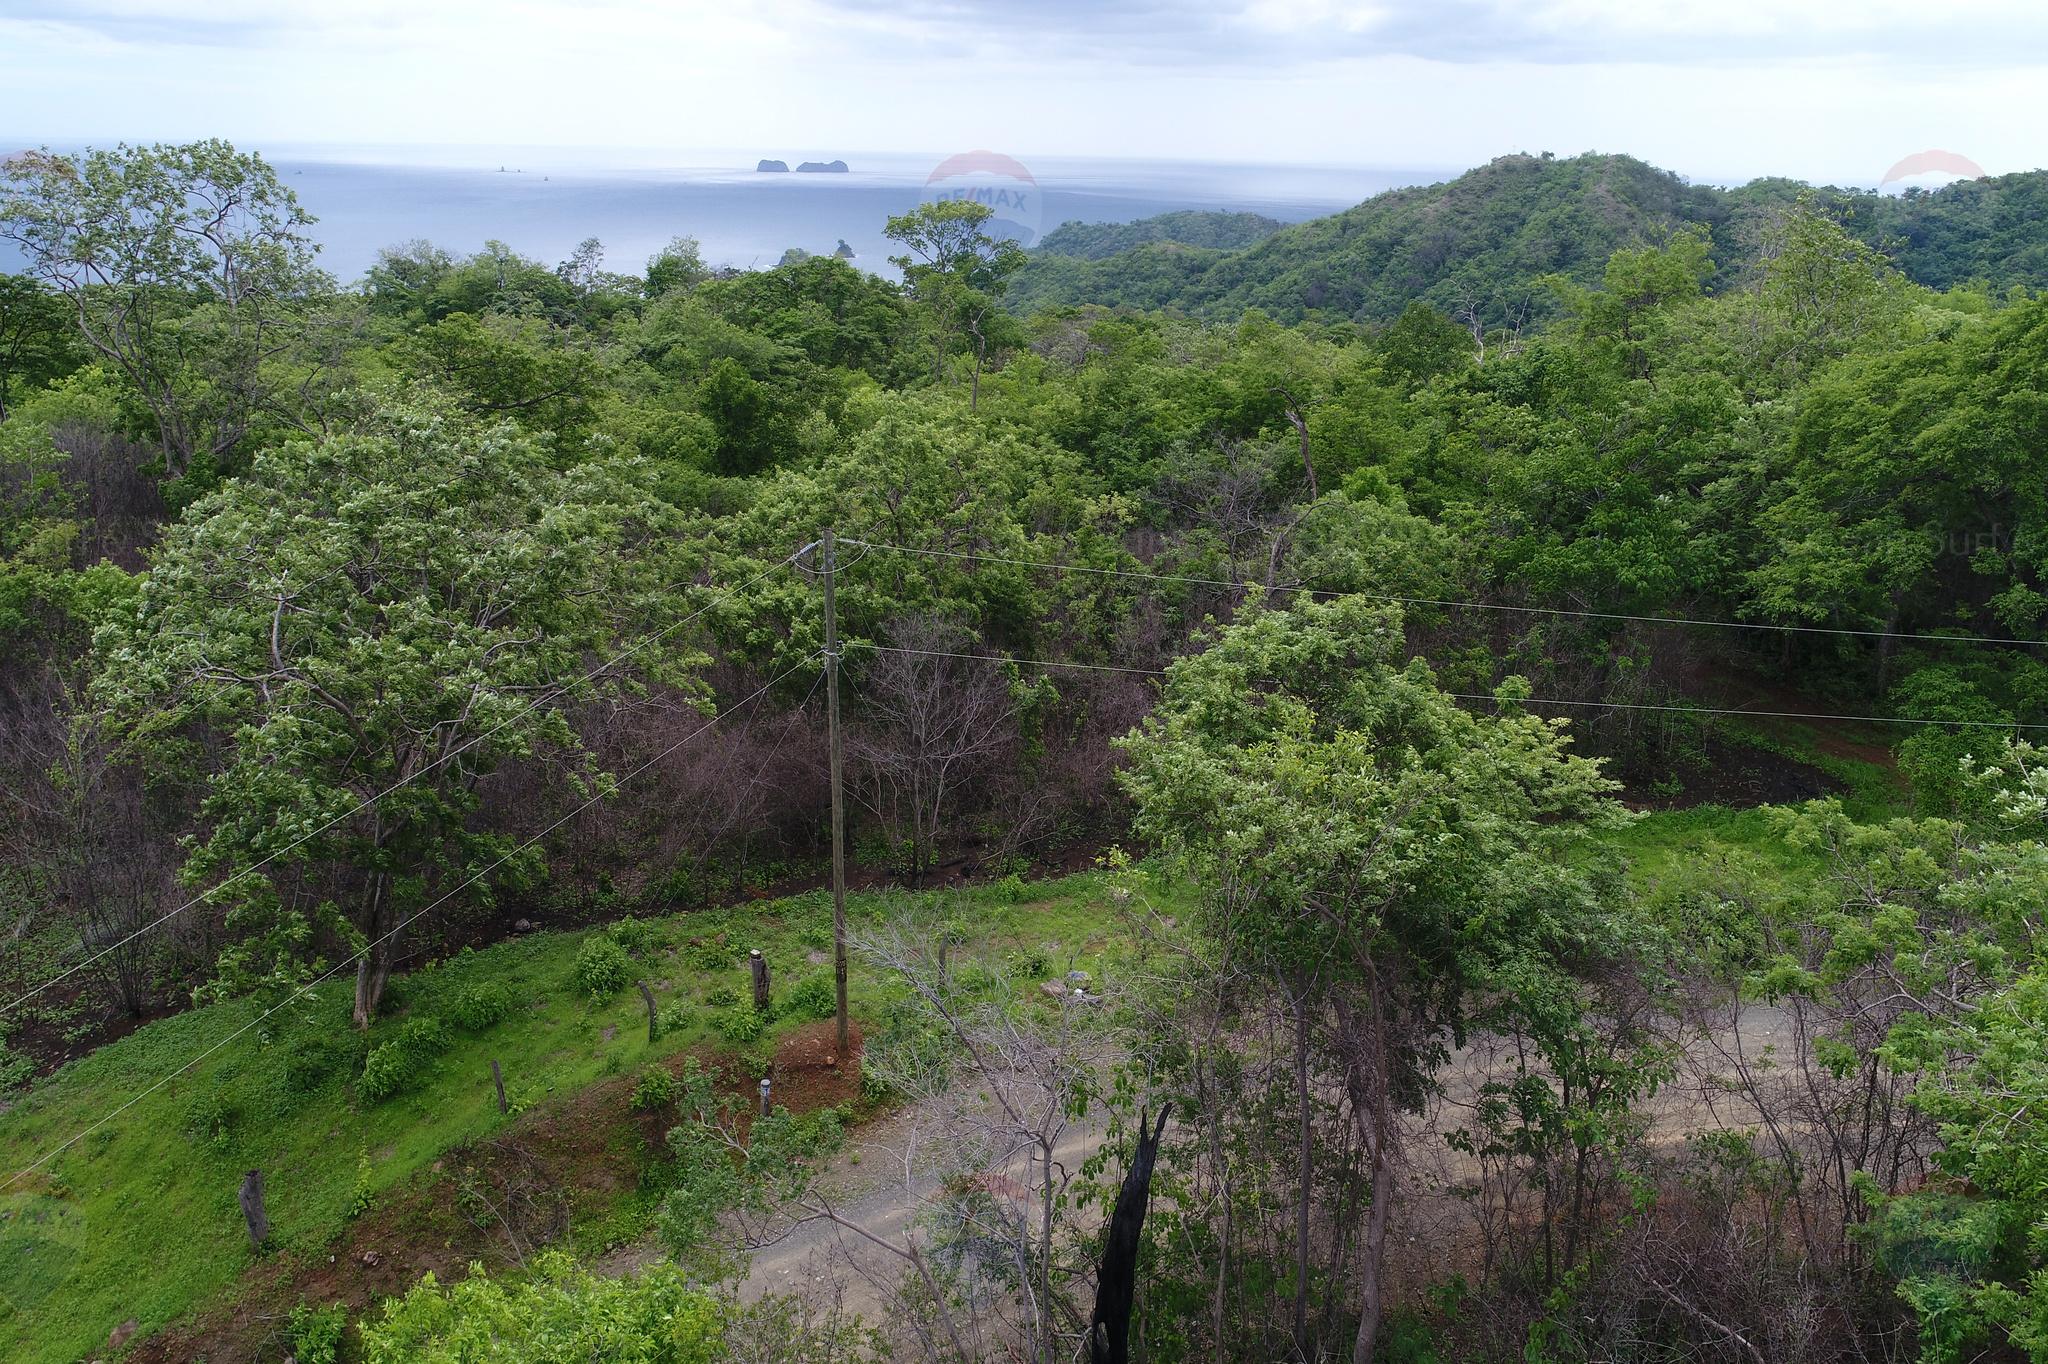 Pacific Heights, Playa Penca, Costa Rica